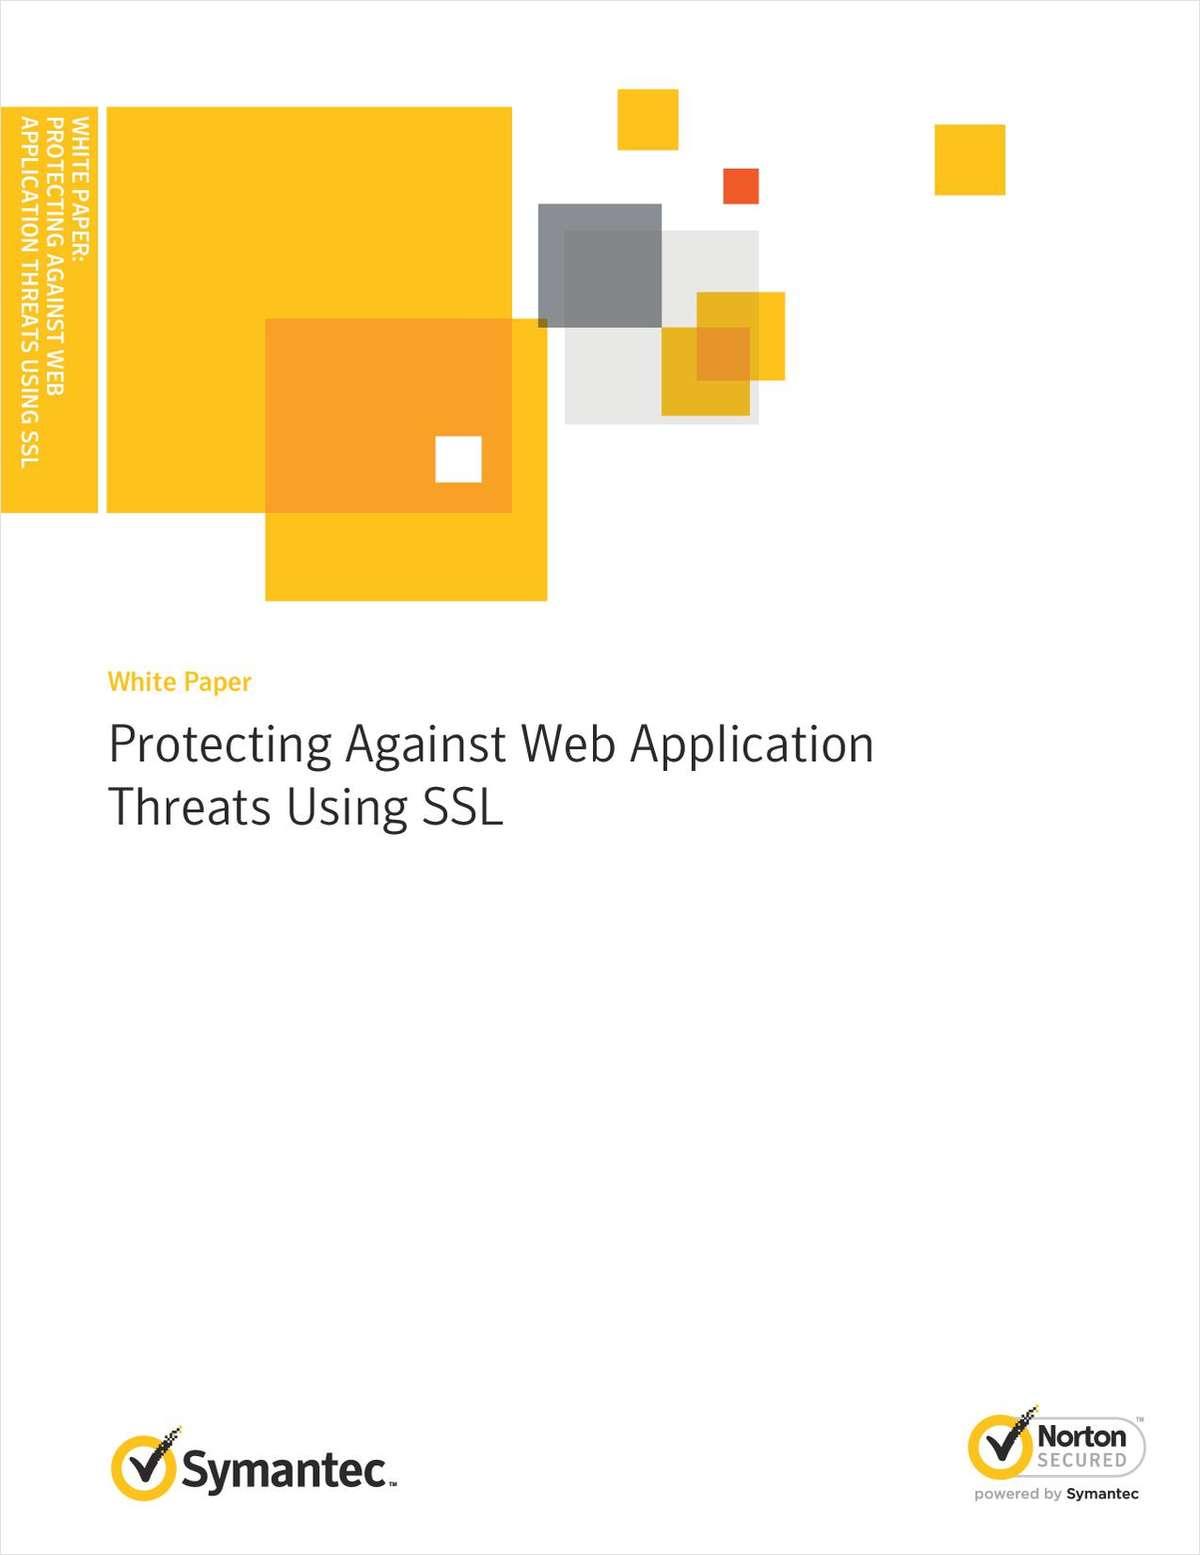 Protecting Against Web Application Threats Using SSL